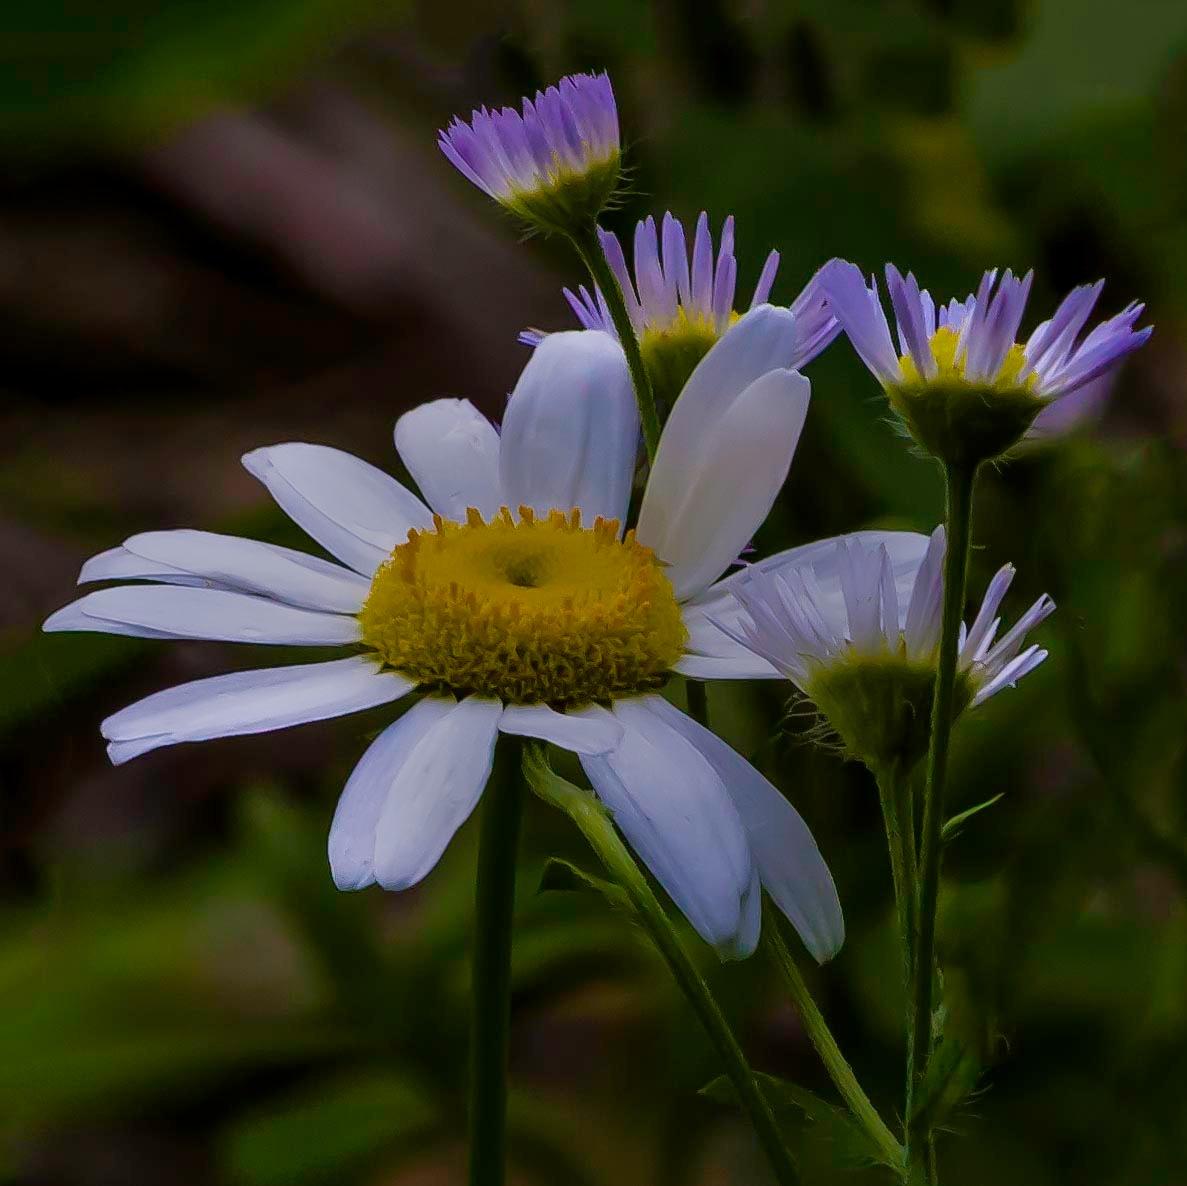 Wildflowers As Daylight Ebbs by Edward Brown